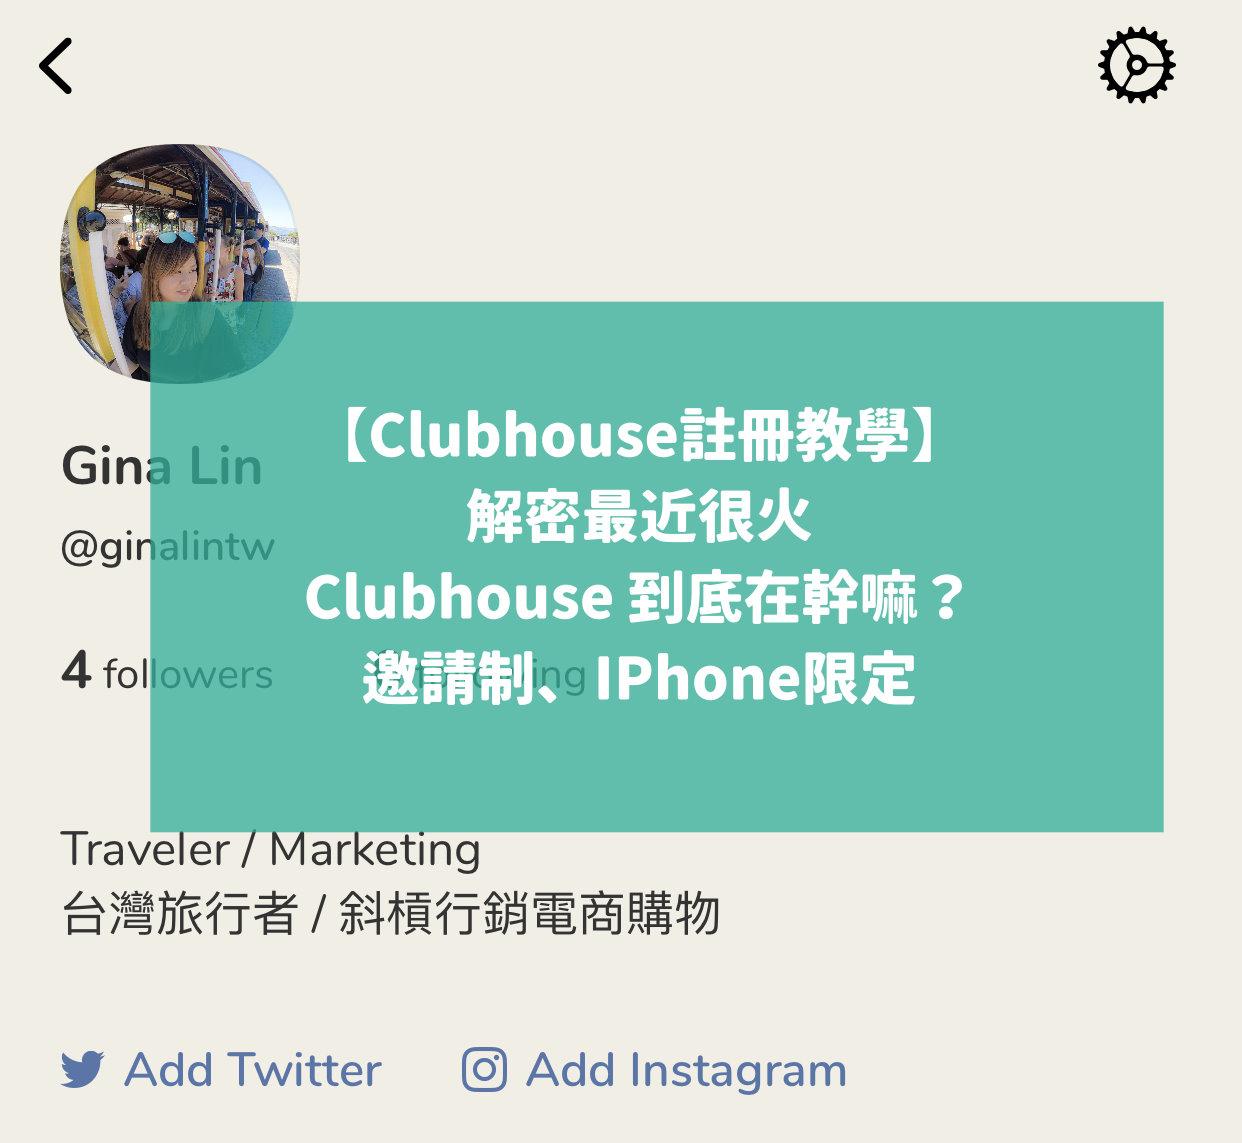 【Clubhouse註冊教學】邀請函簡訊制、IPhone限定|不用邀請碼怎麼加入Clubhouse? @GINA LIN